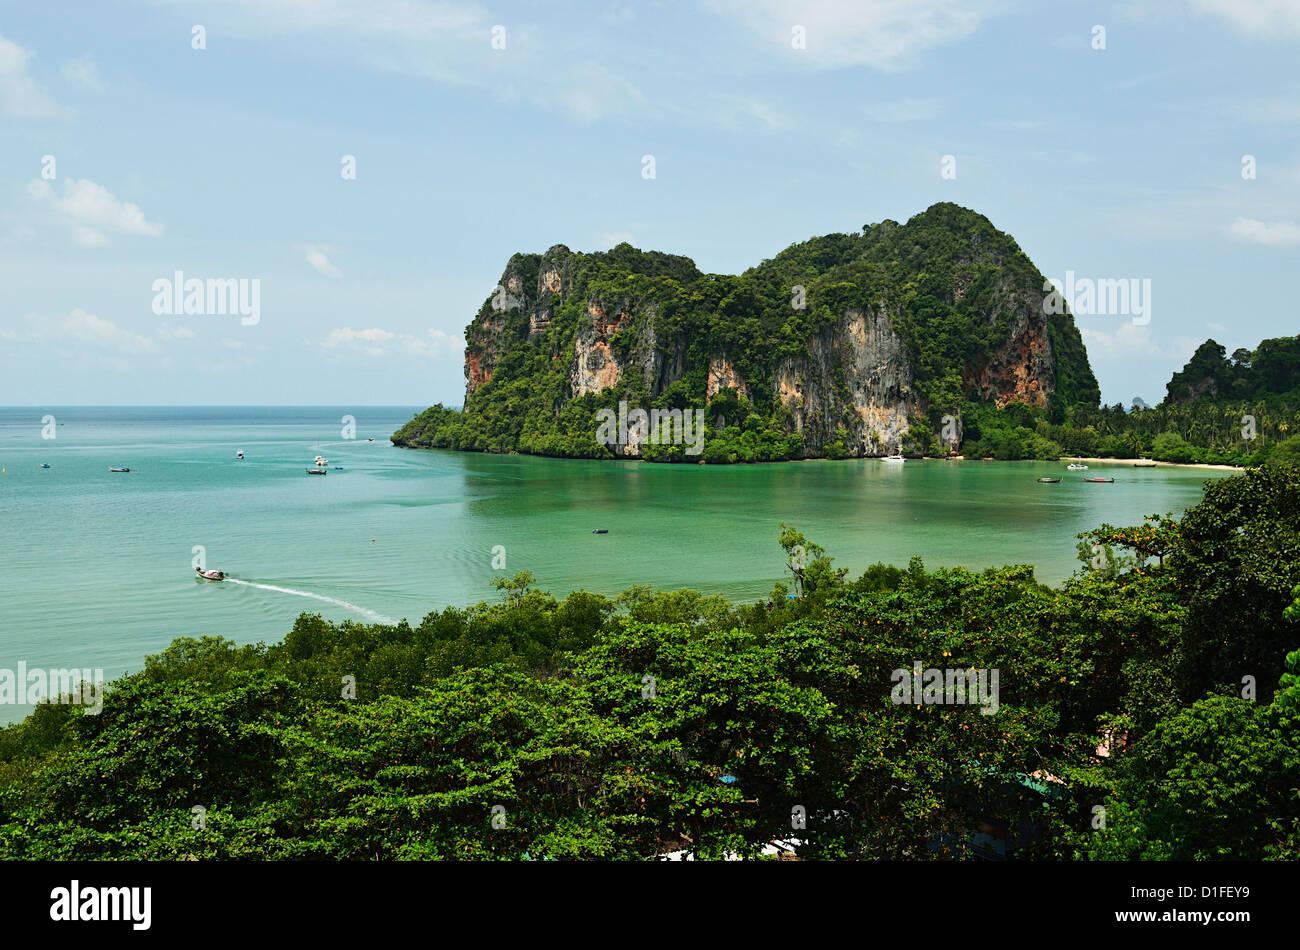 Railay East Bay, Rai Leh (Railay), Andaman Coast, Krabi Province, Thailand, Southeast Asia, Asia - Stock Image